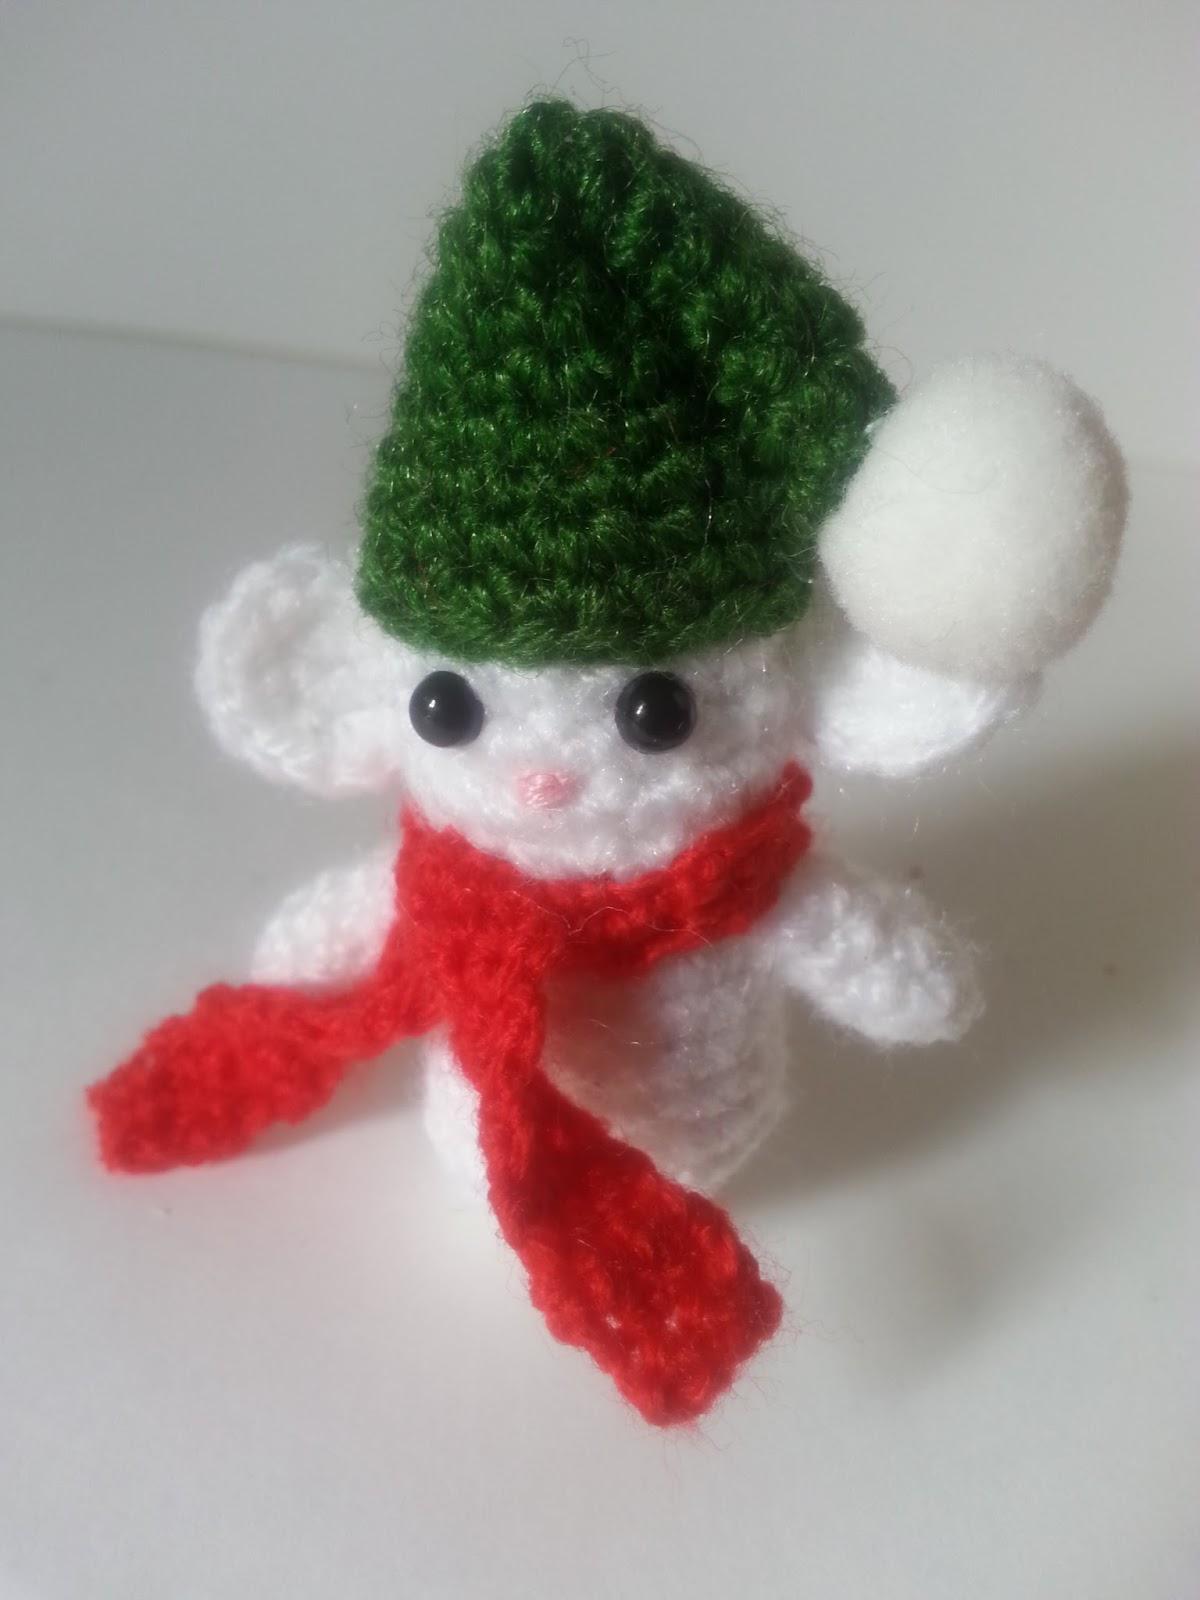 anygurumi: Día 8. Ratoncitos navideños